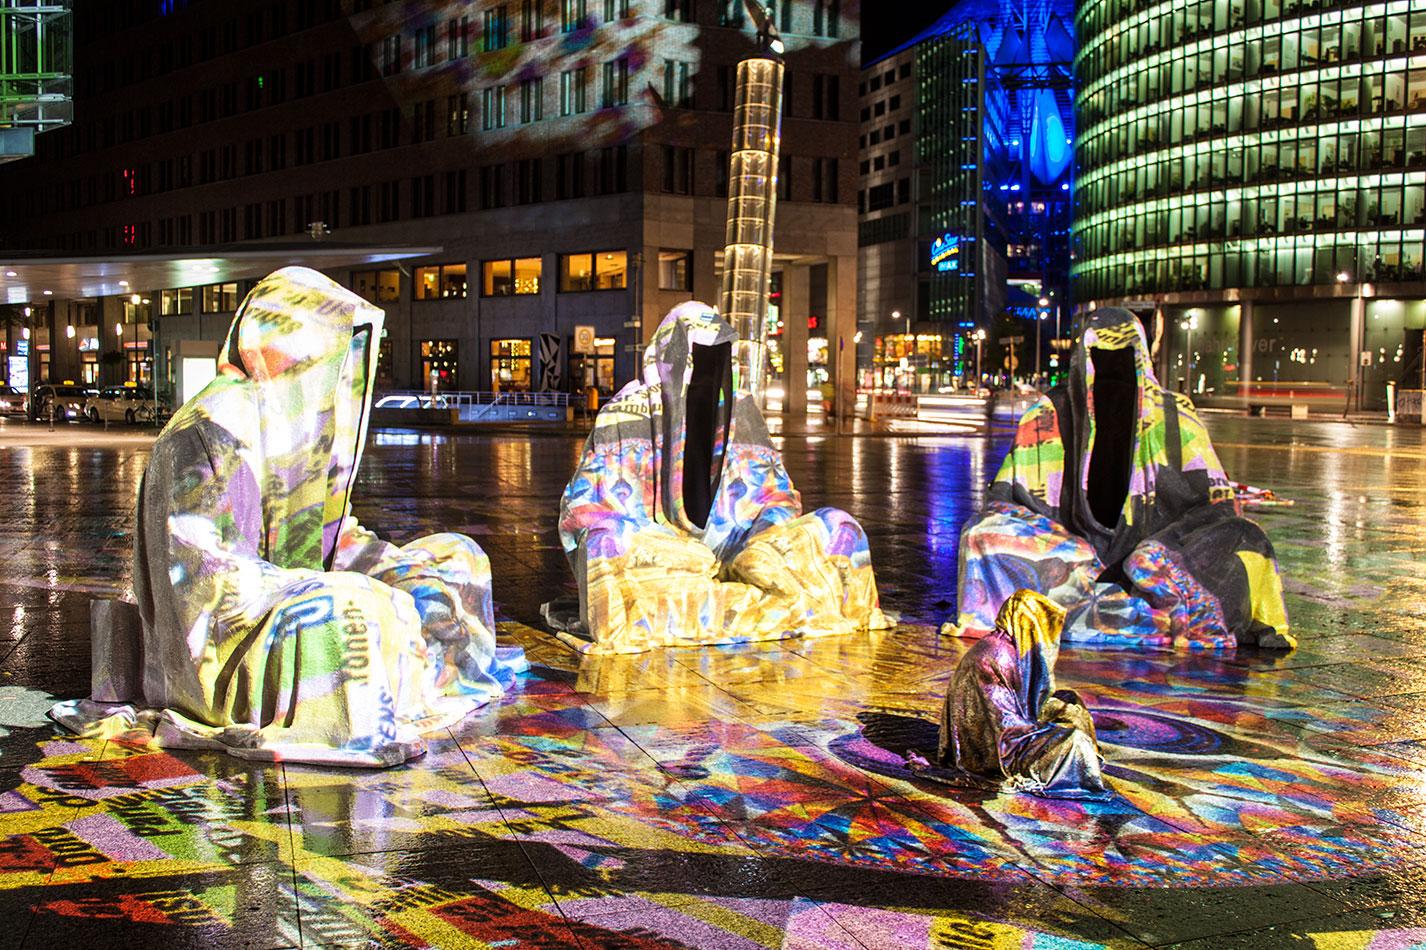 festival-of-lights-berlin-light-art-festival-contemporary-fine-art-design-show-large-scale-sculpture-guardiansof-time-manfred-kili-kielnhofer-sculpture-3899